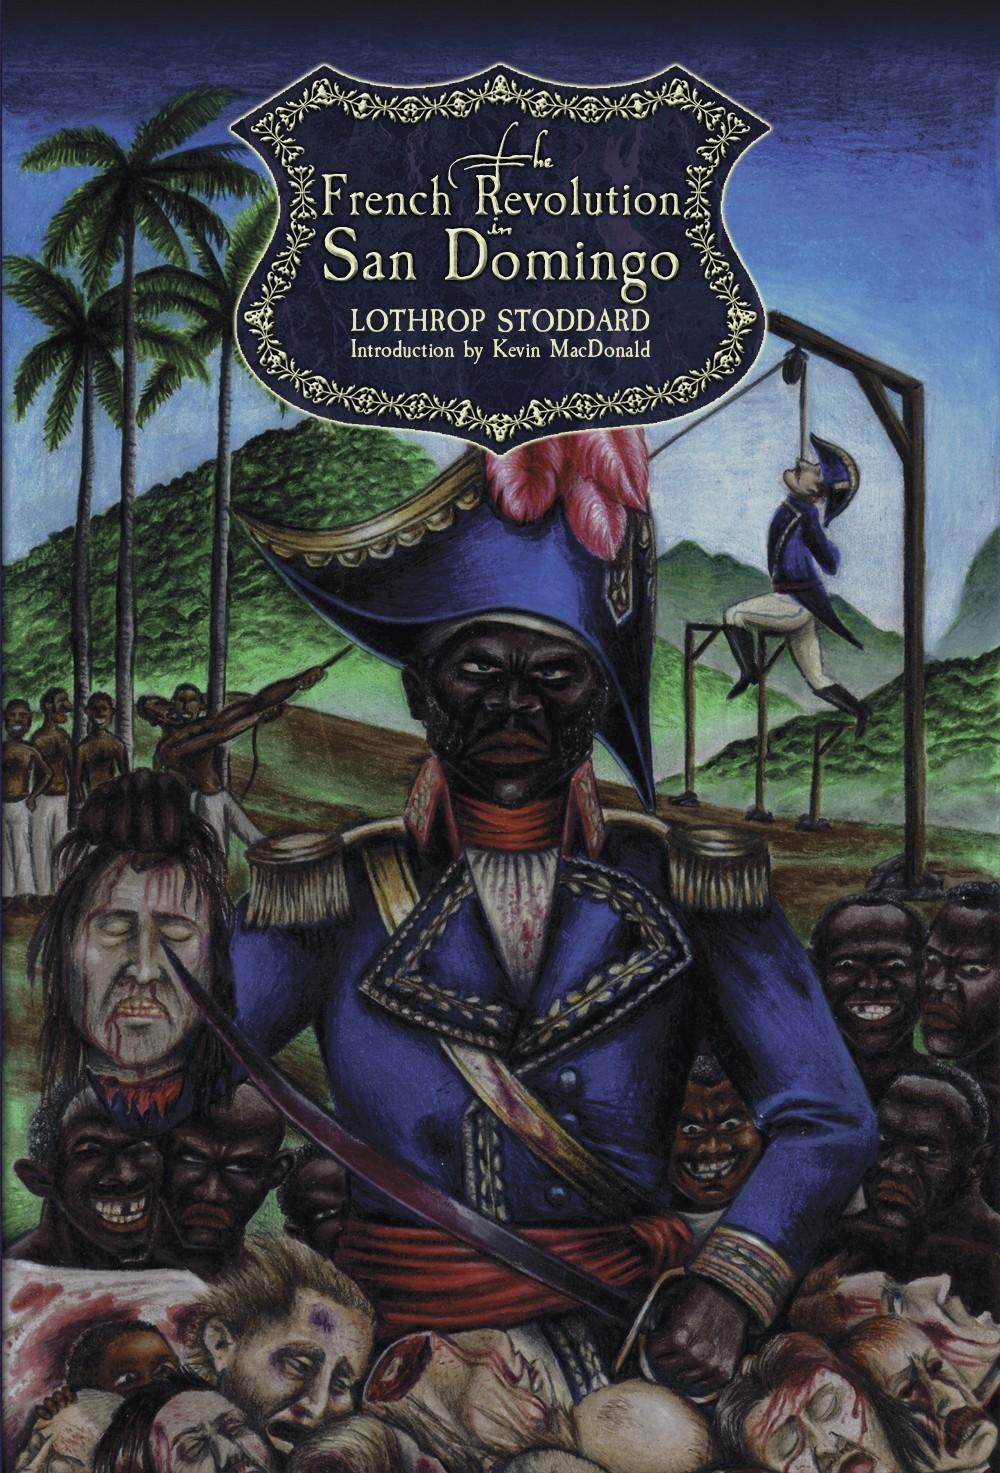 The French revolution in San Domingo Lothrop Stoddard